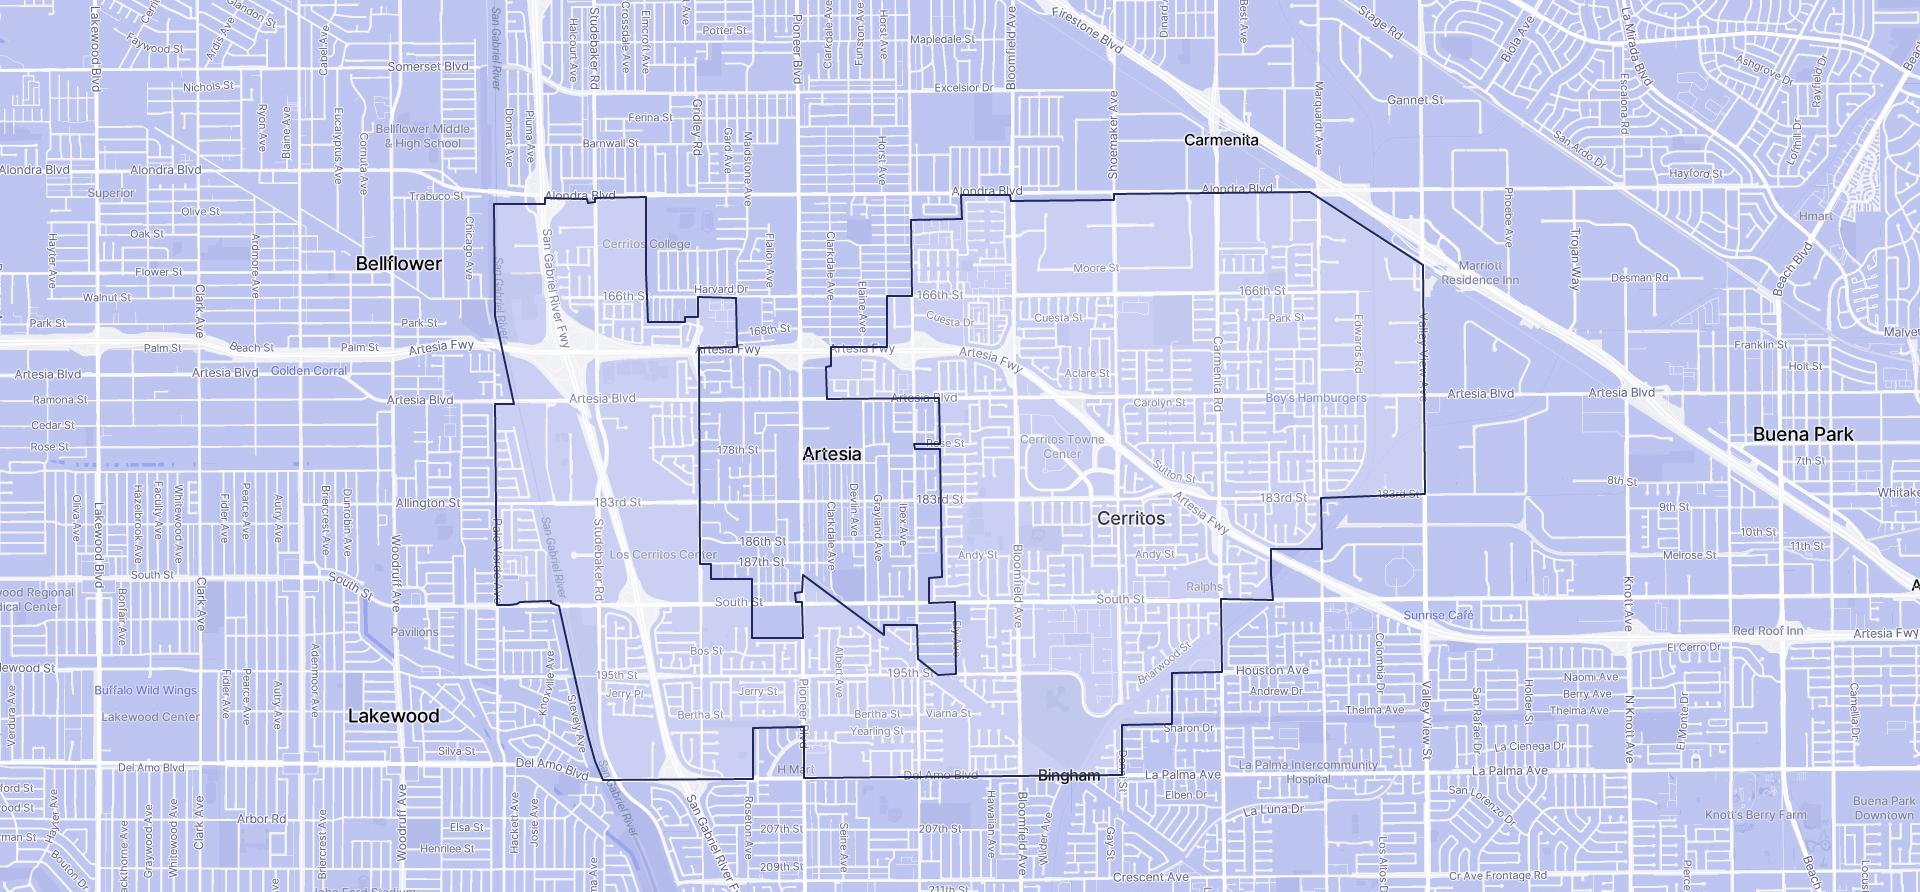 Image of Cerritos boundaries on a map.